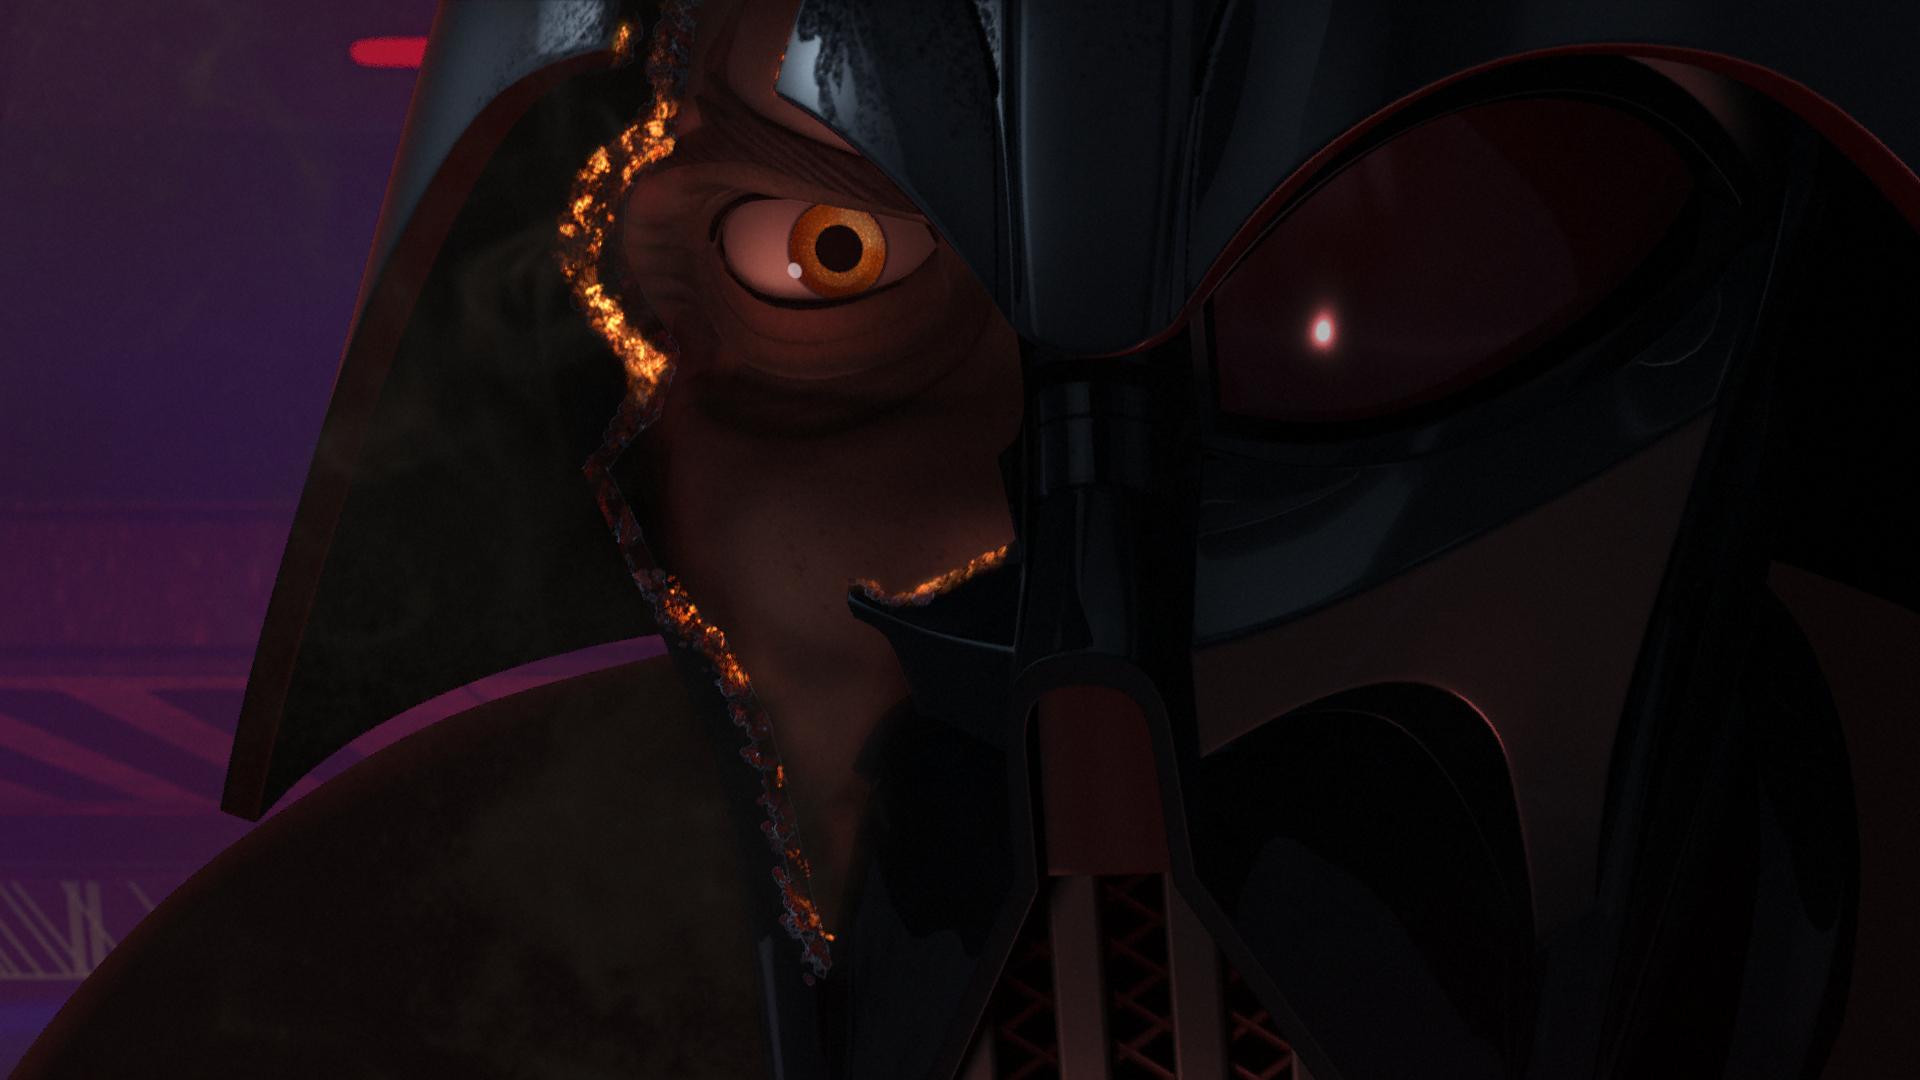 Darth Vader | Star Wars Rebels Wiki | FANDOM powered by Wikia